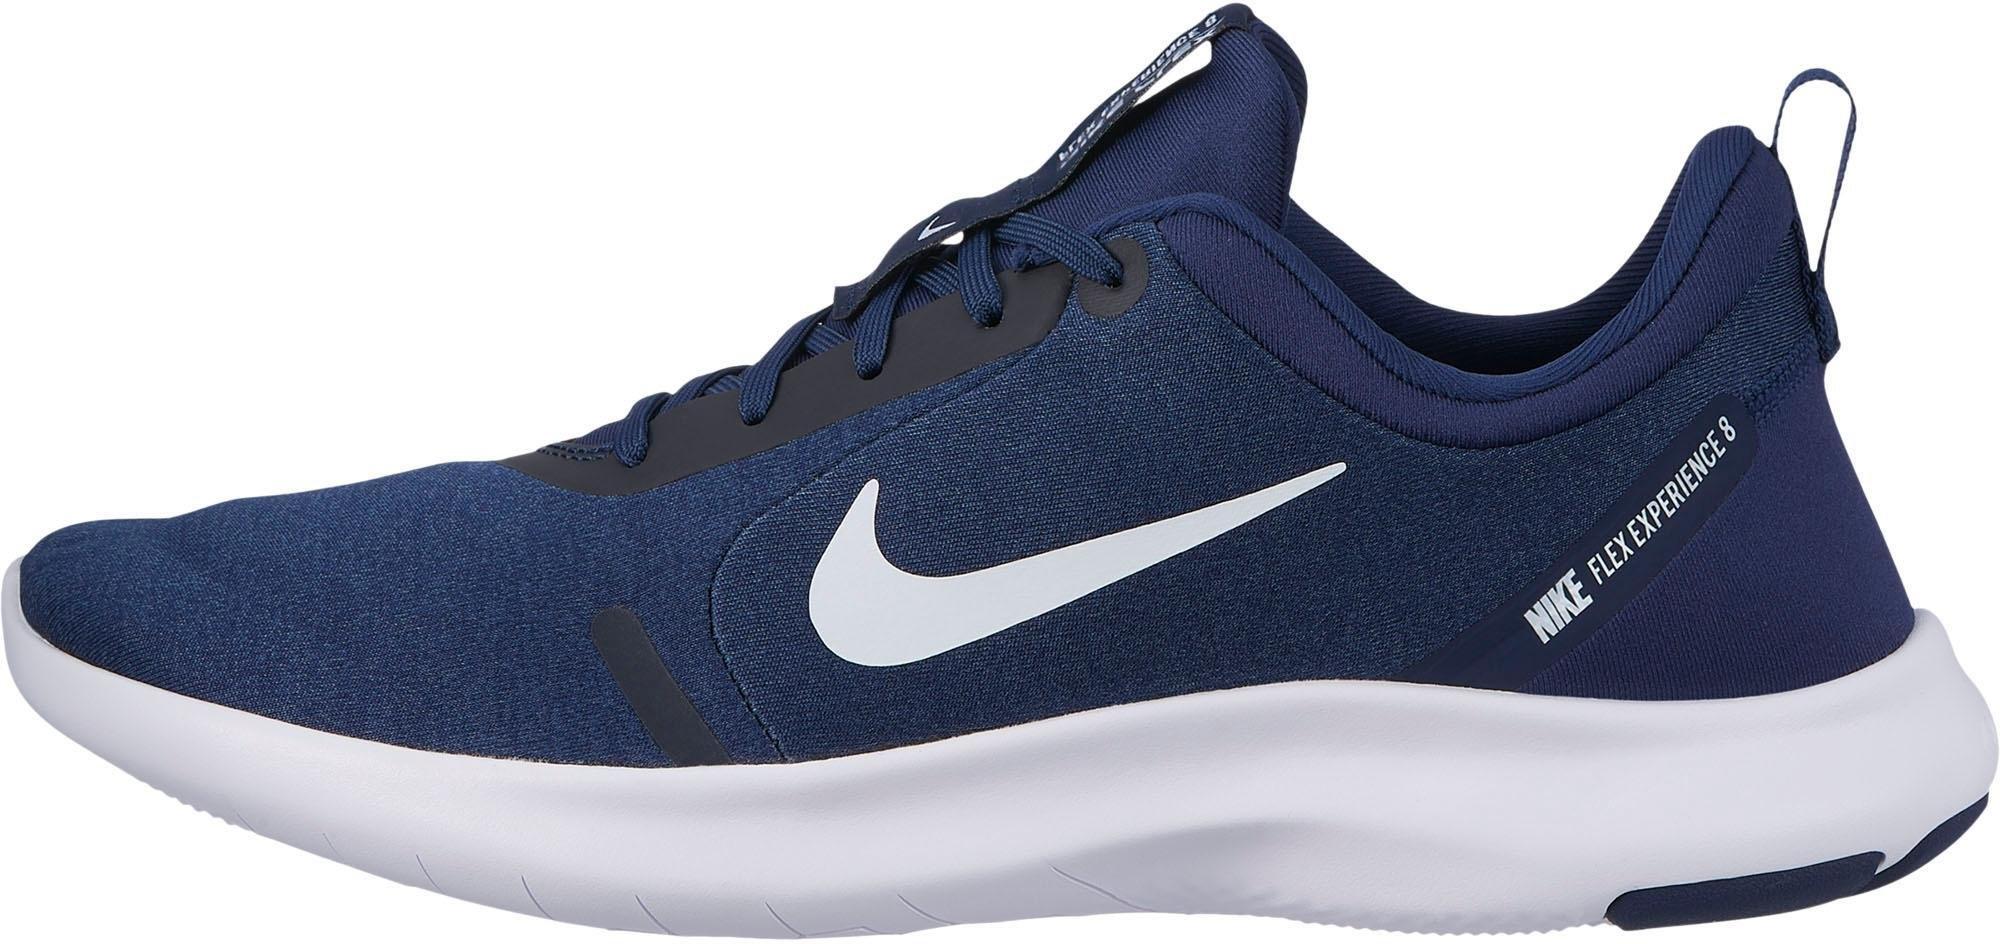 8 Run Snel Experience Nike Gevonden Runningschoenenflex trCQdsh